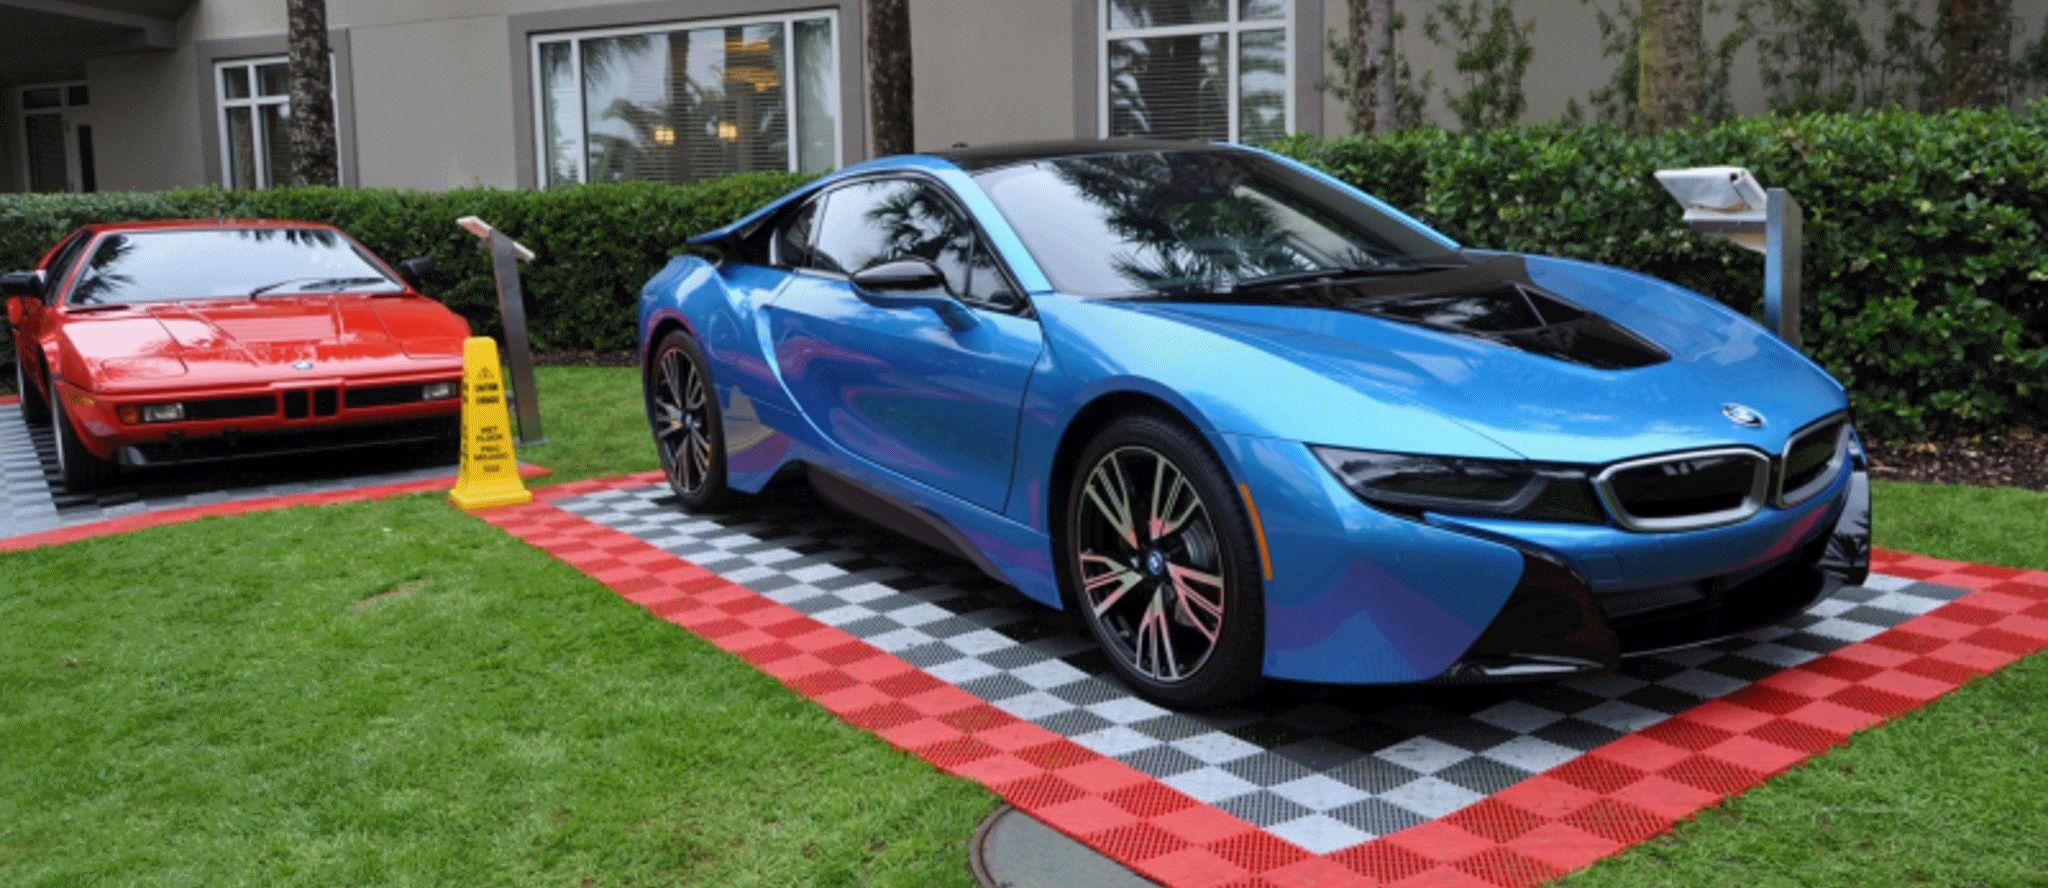 Car-Revs-Daily.com BETA -- DYNAMIC DESKTOP BACKGROUND 2048x888 -- 2015 BMW i8